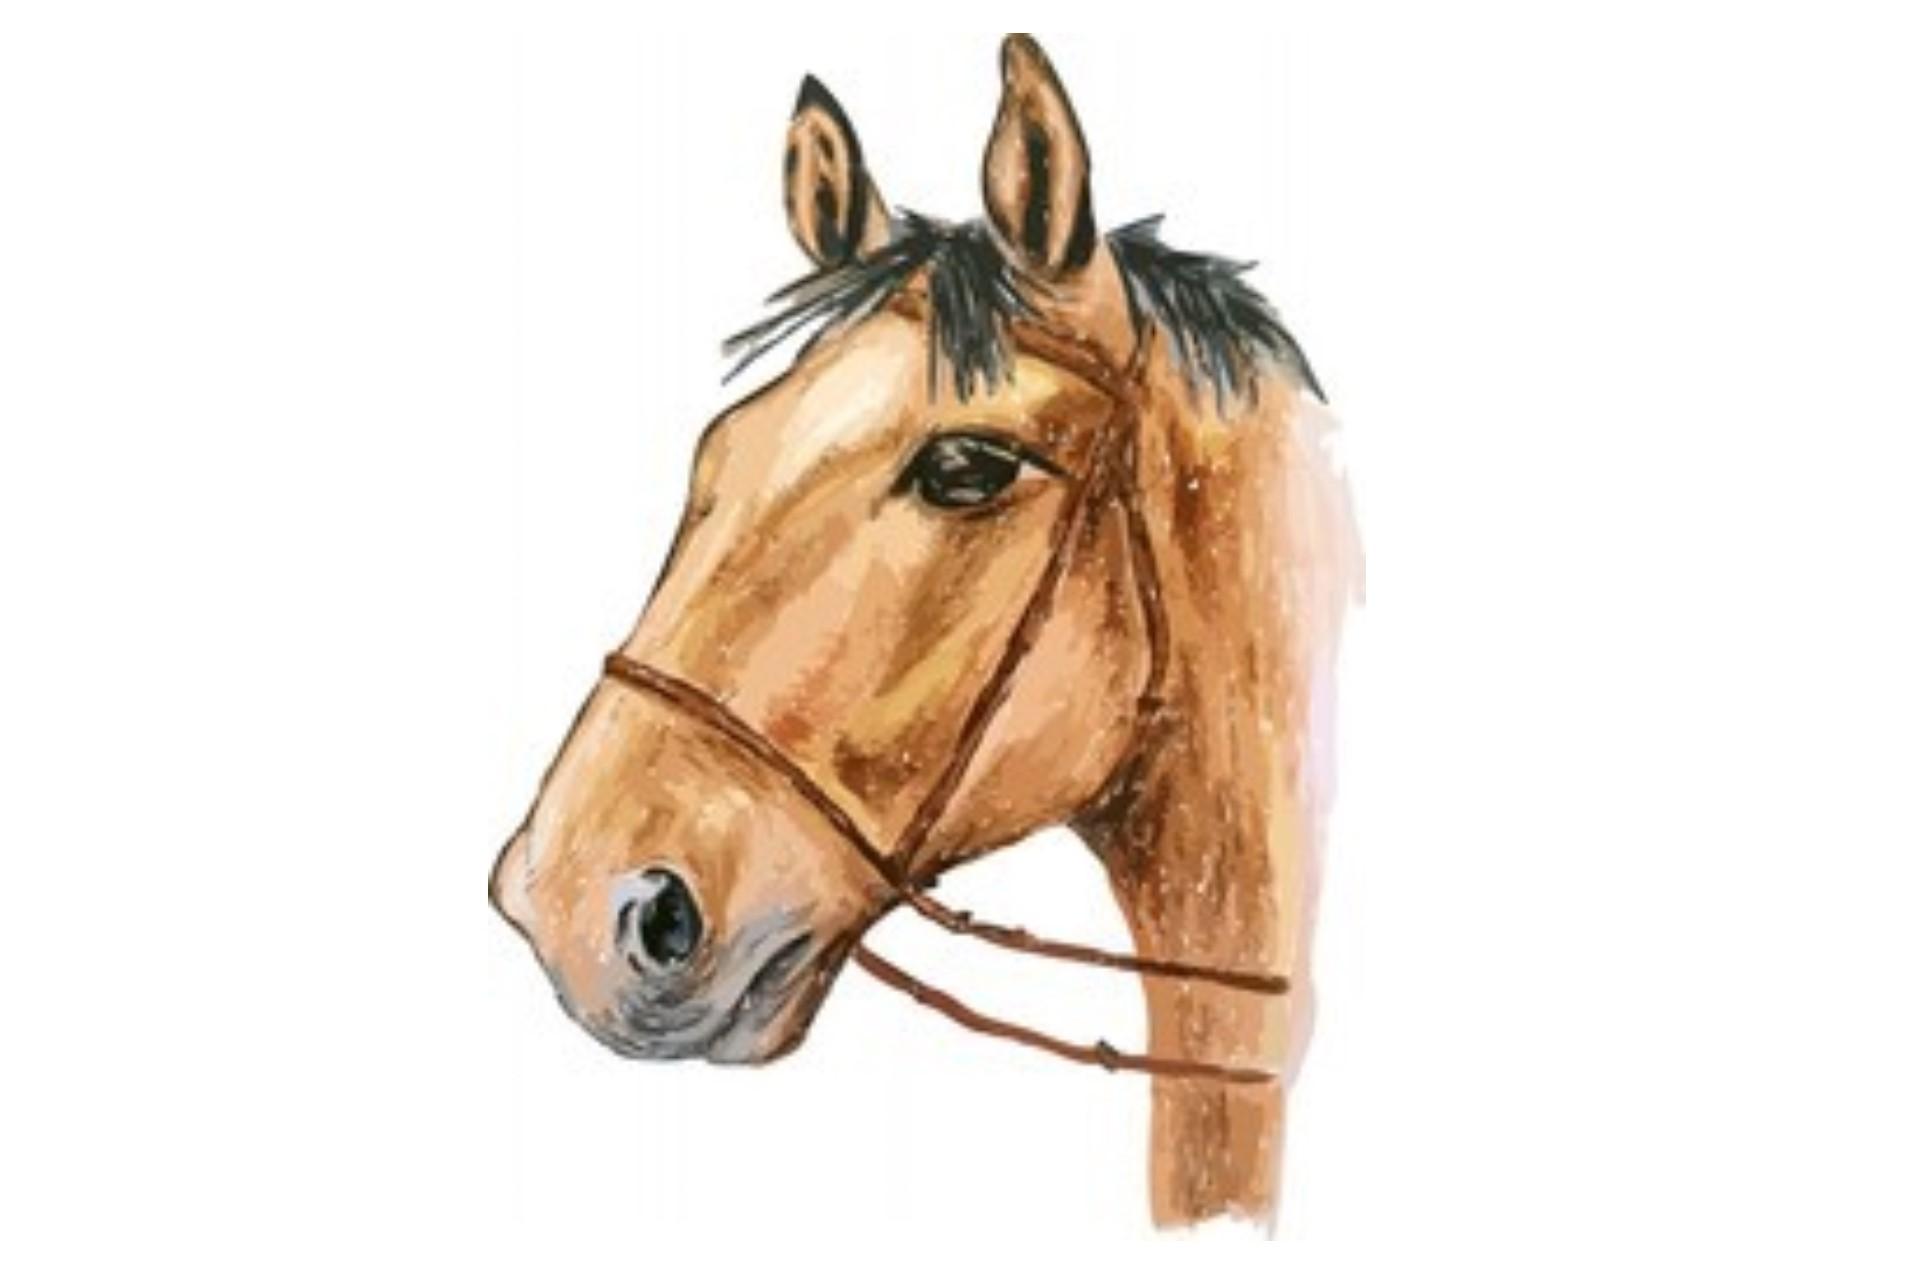 draw horse eye